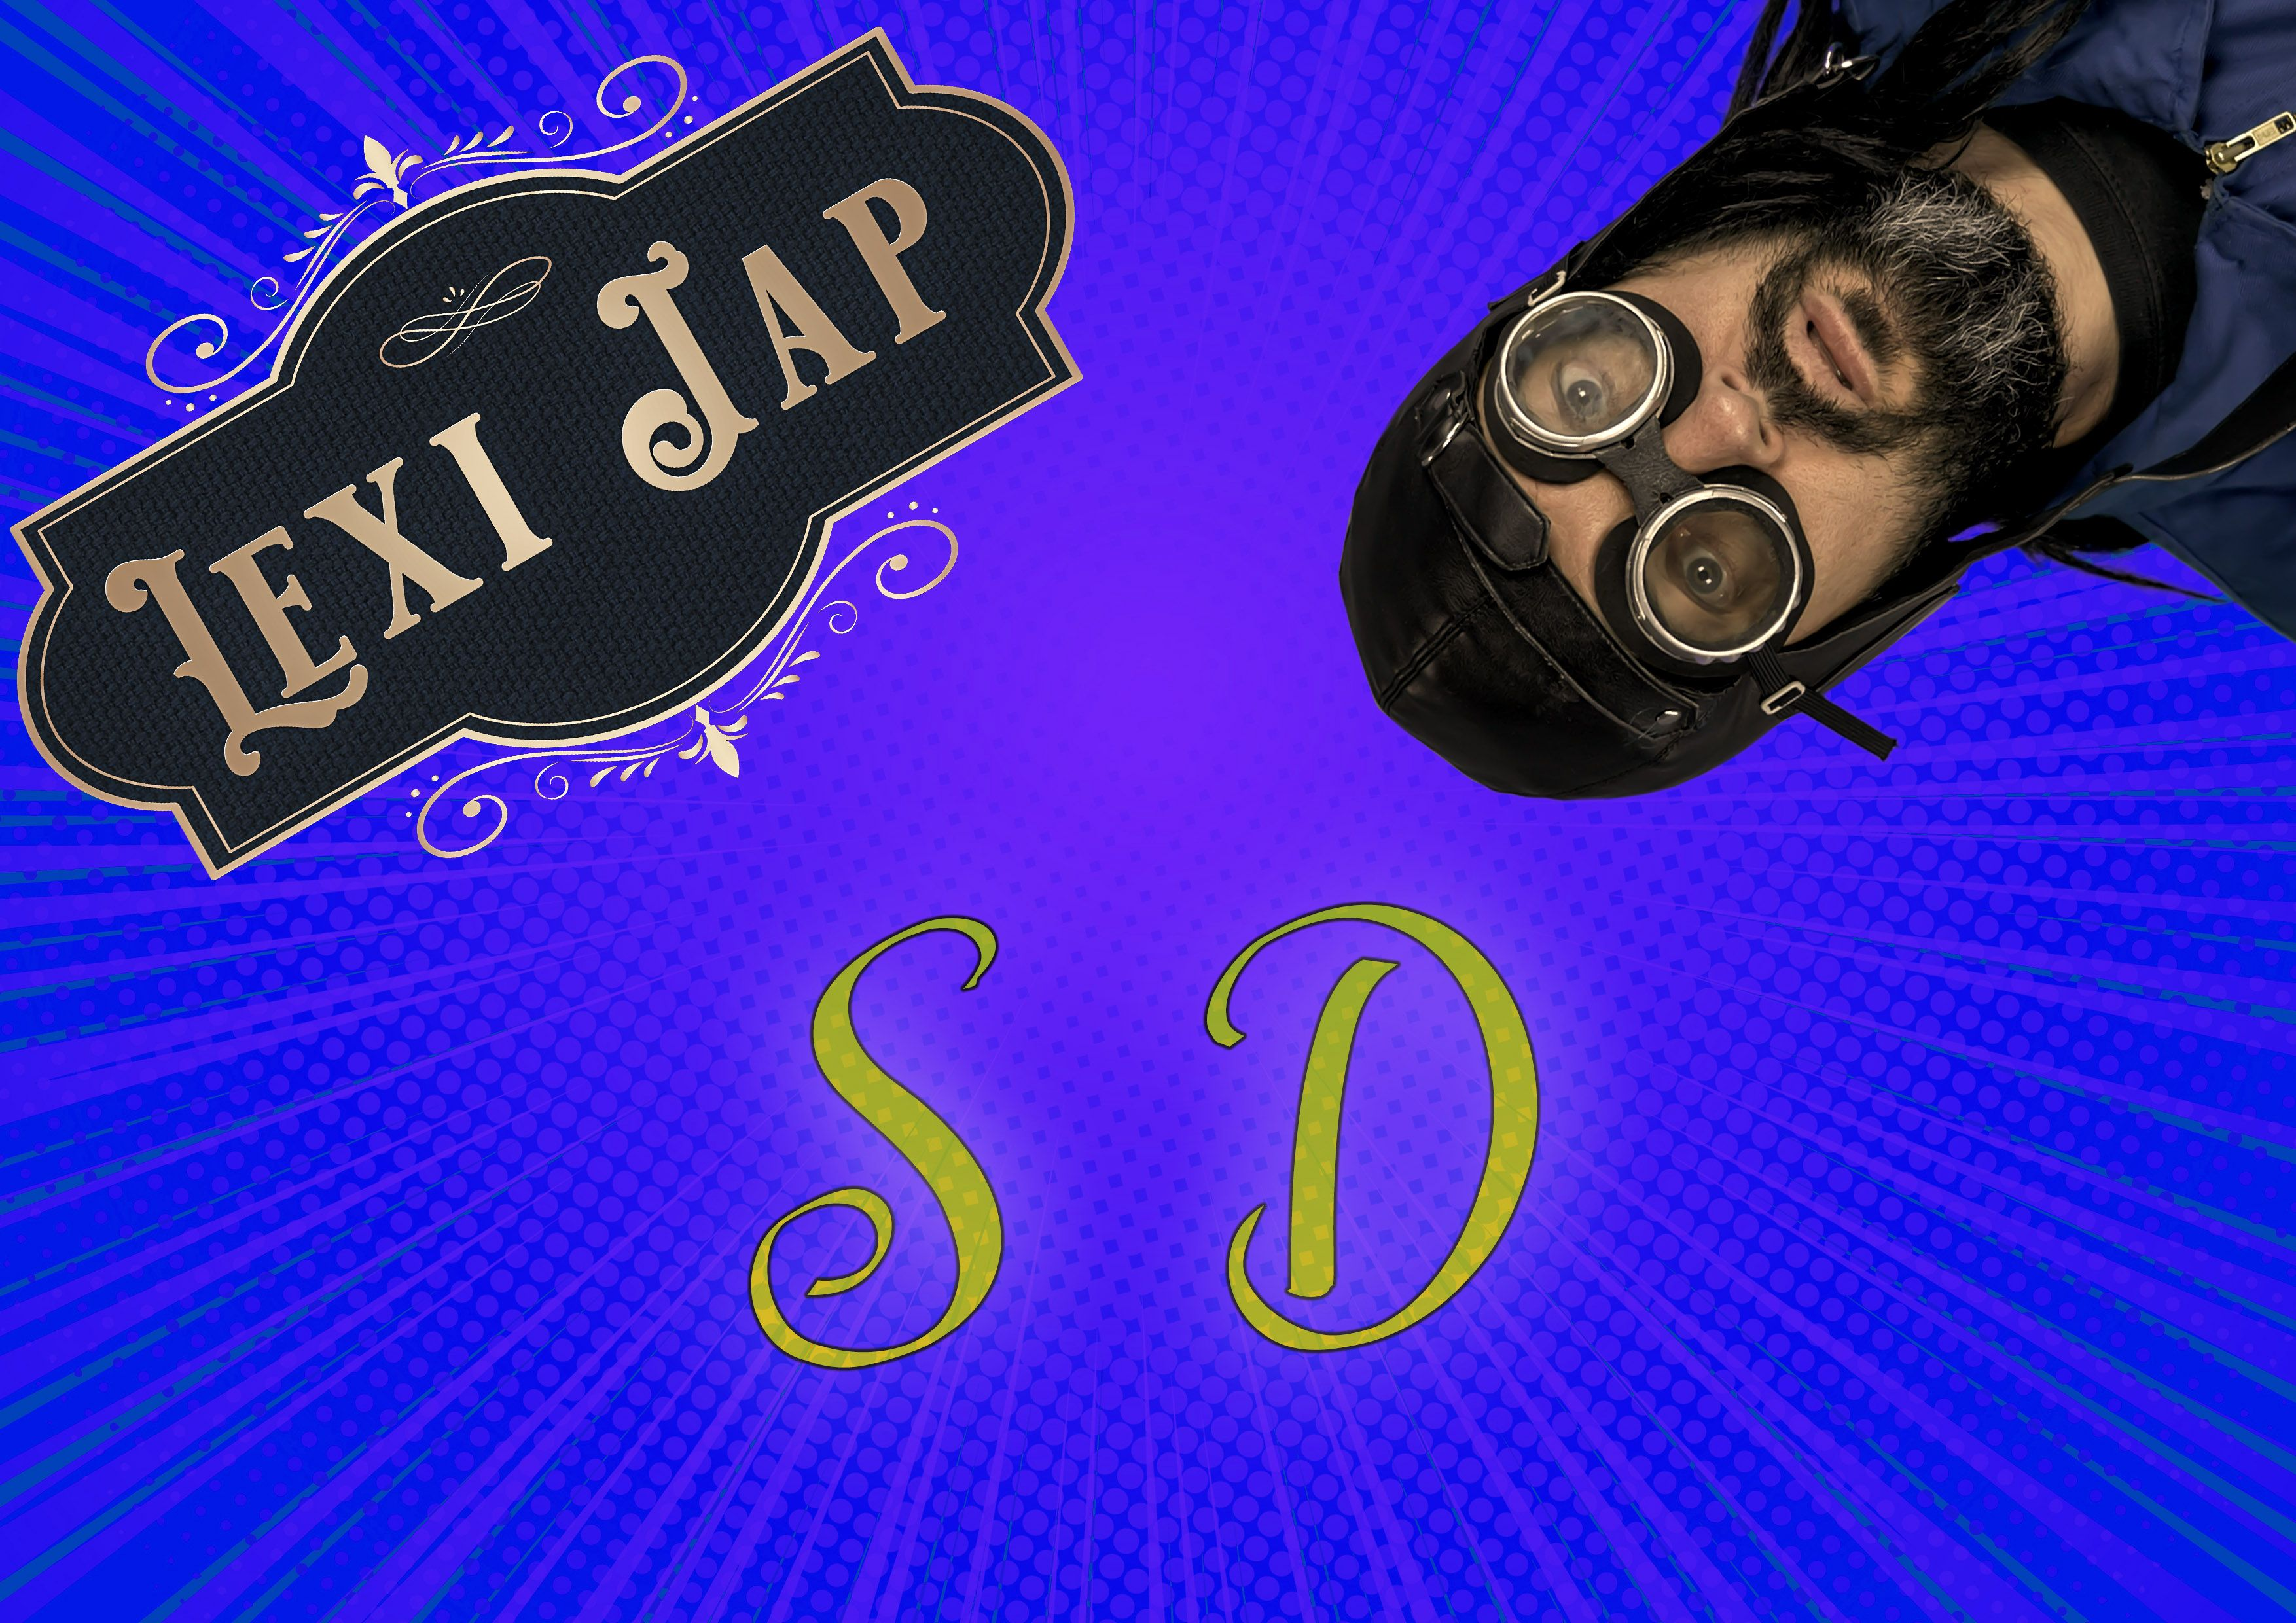 LexiJap-SD.jpg